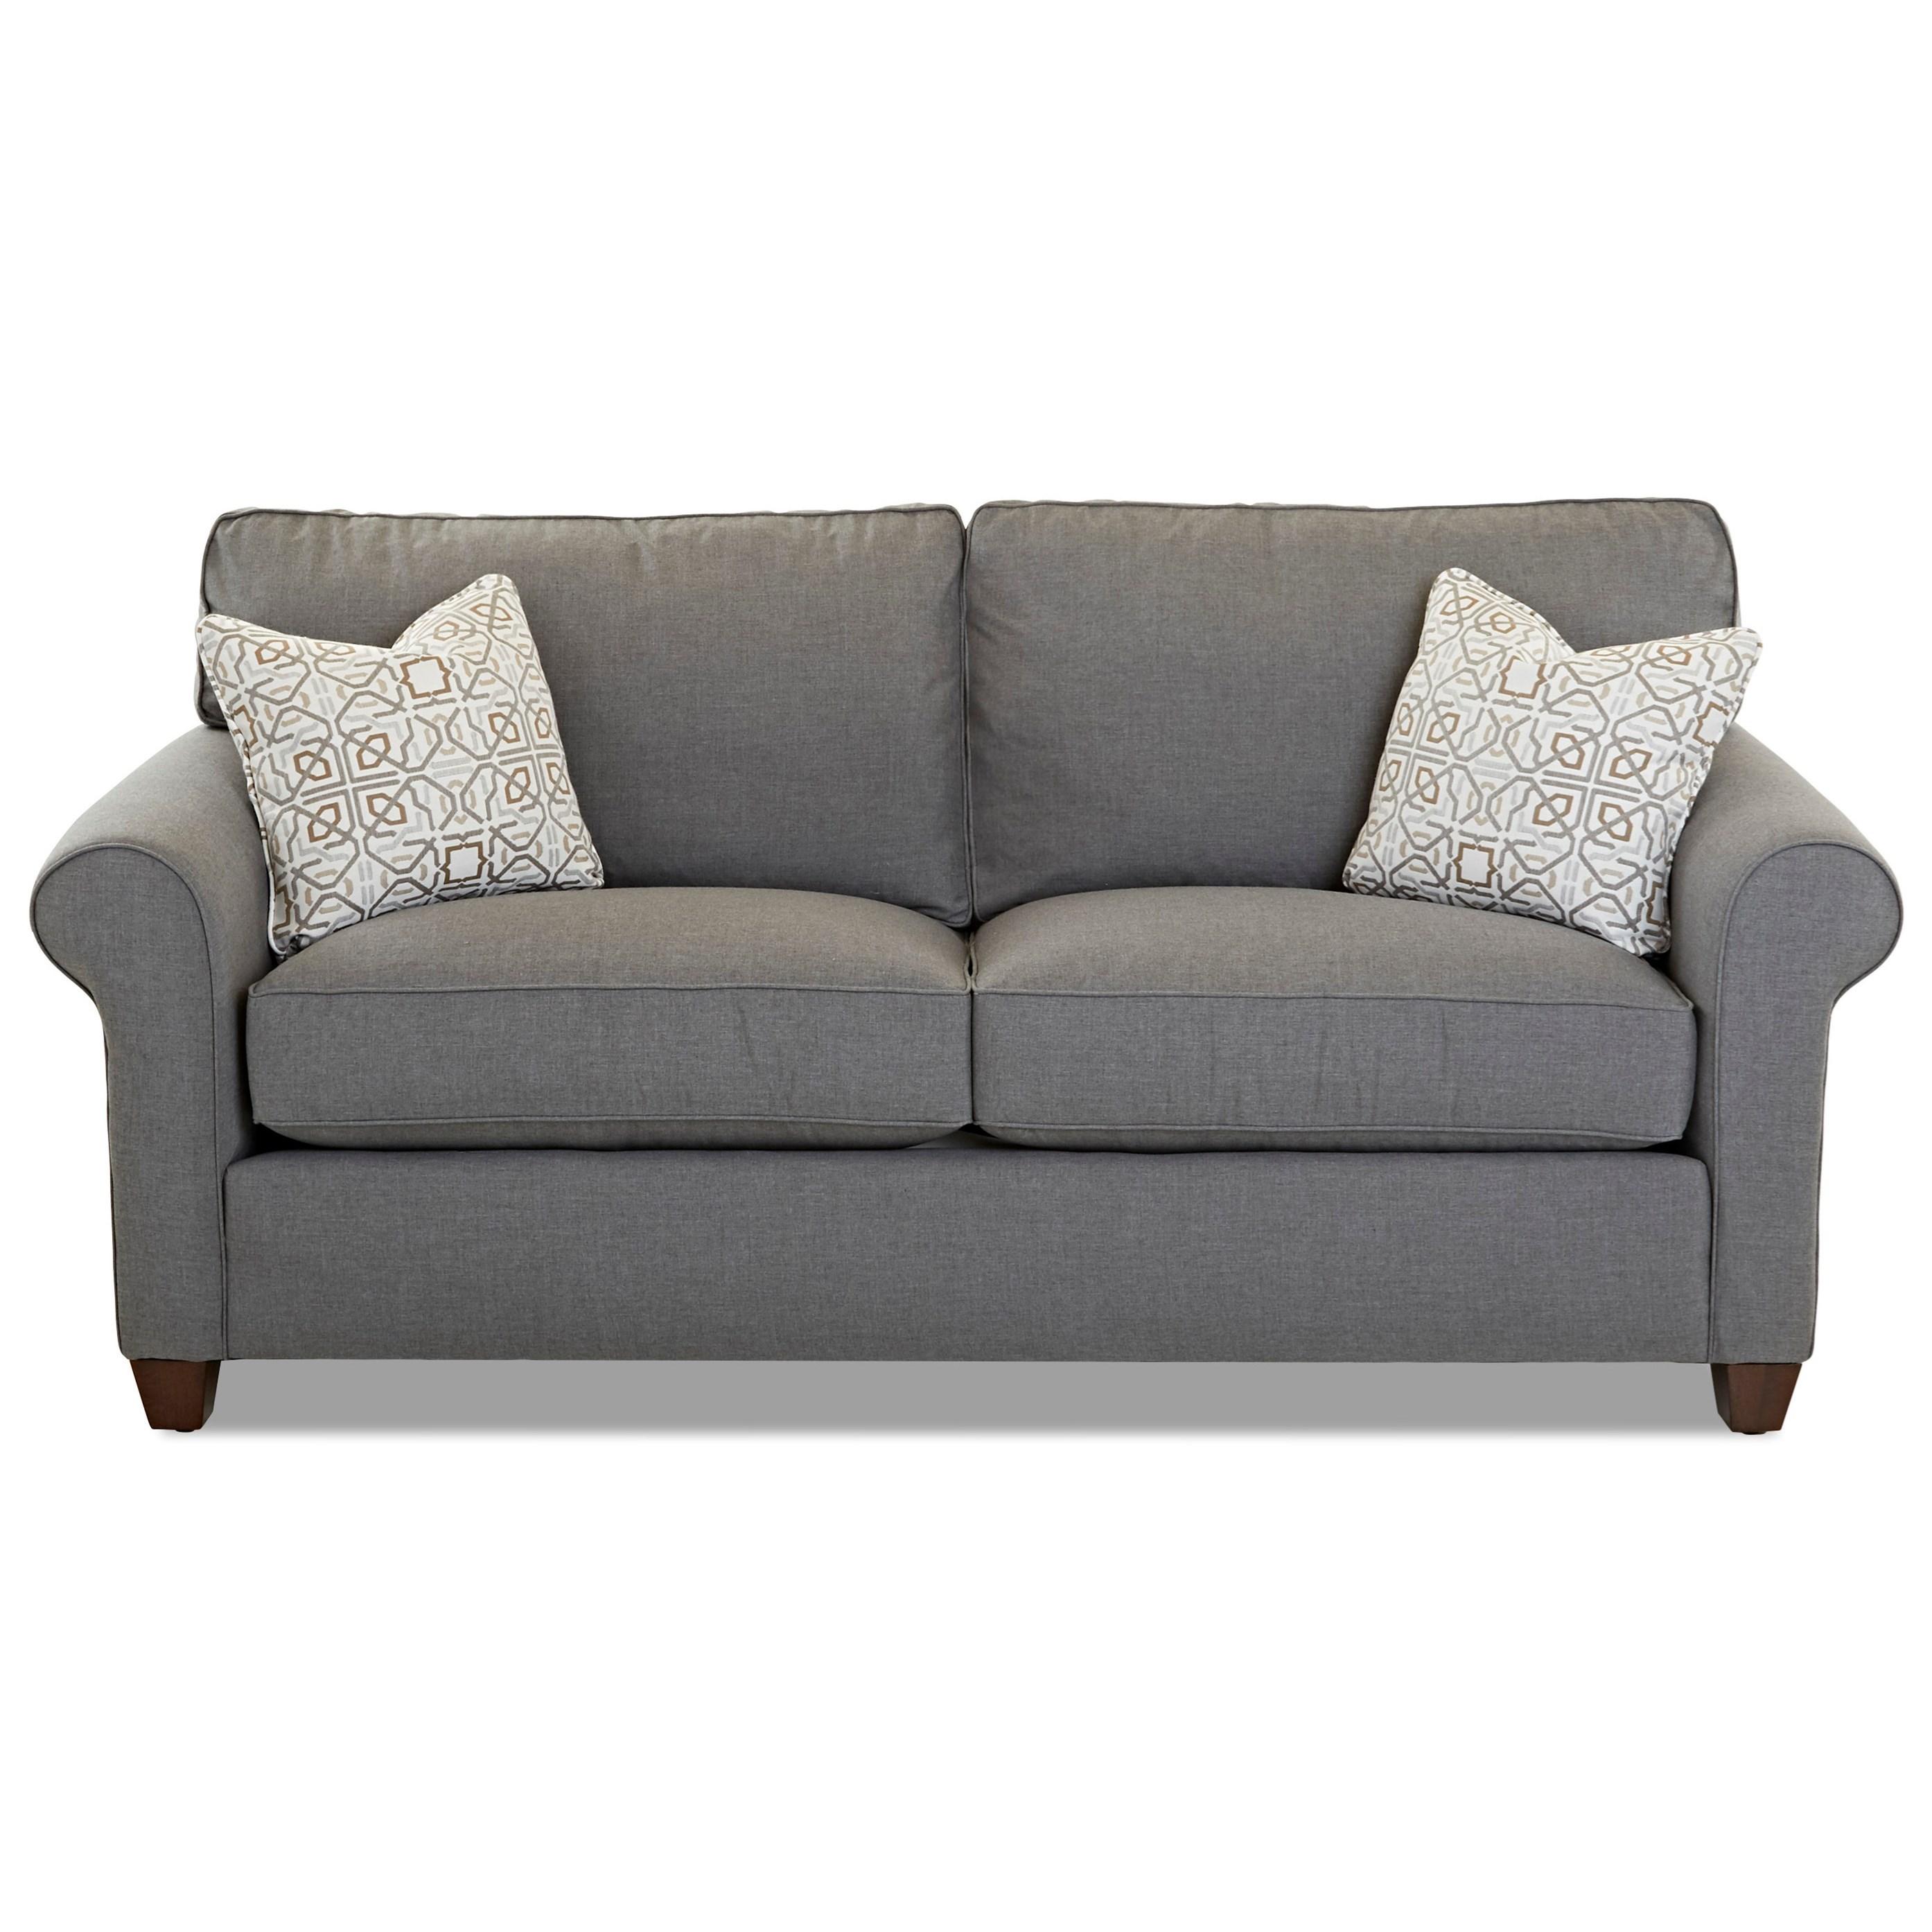 Lillington Distinctions  Stationary Sofa by Klaussner at Johnny Janosik